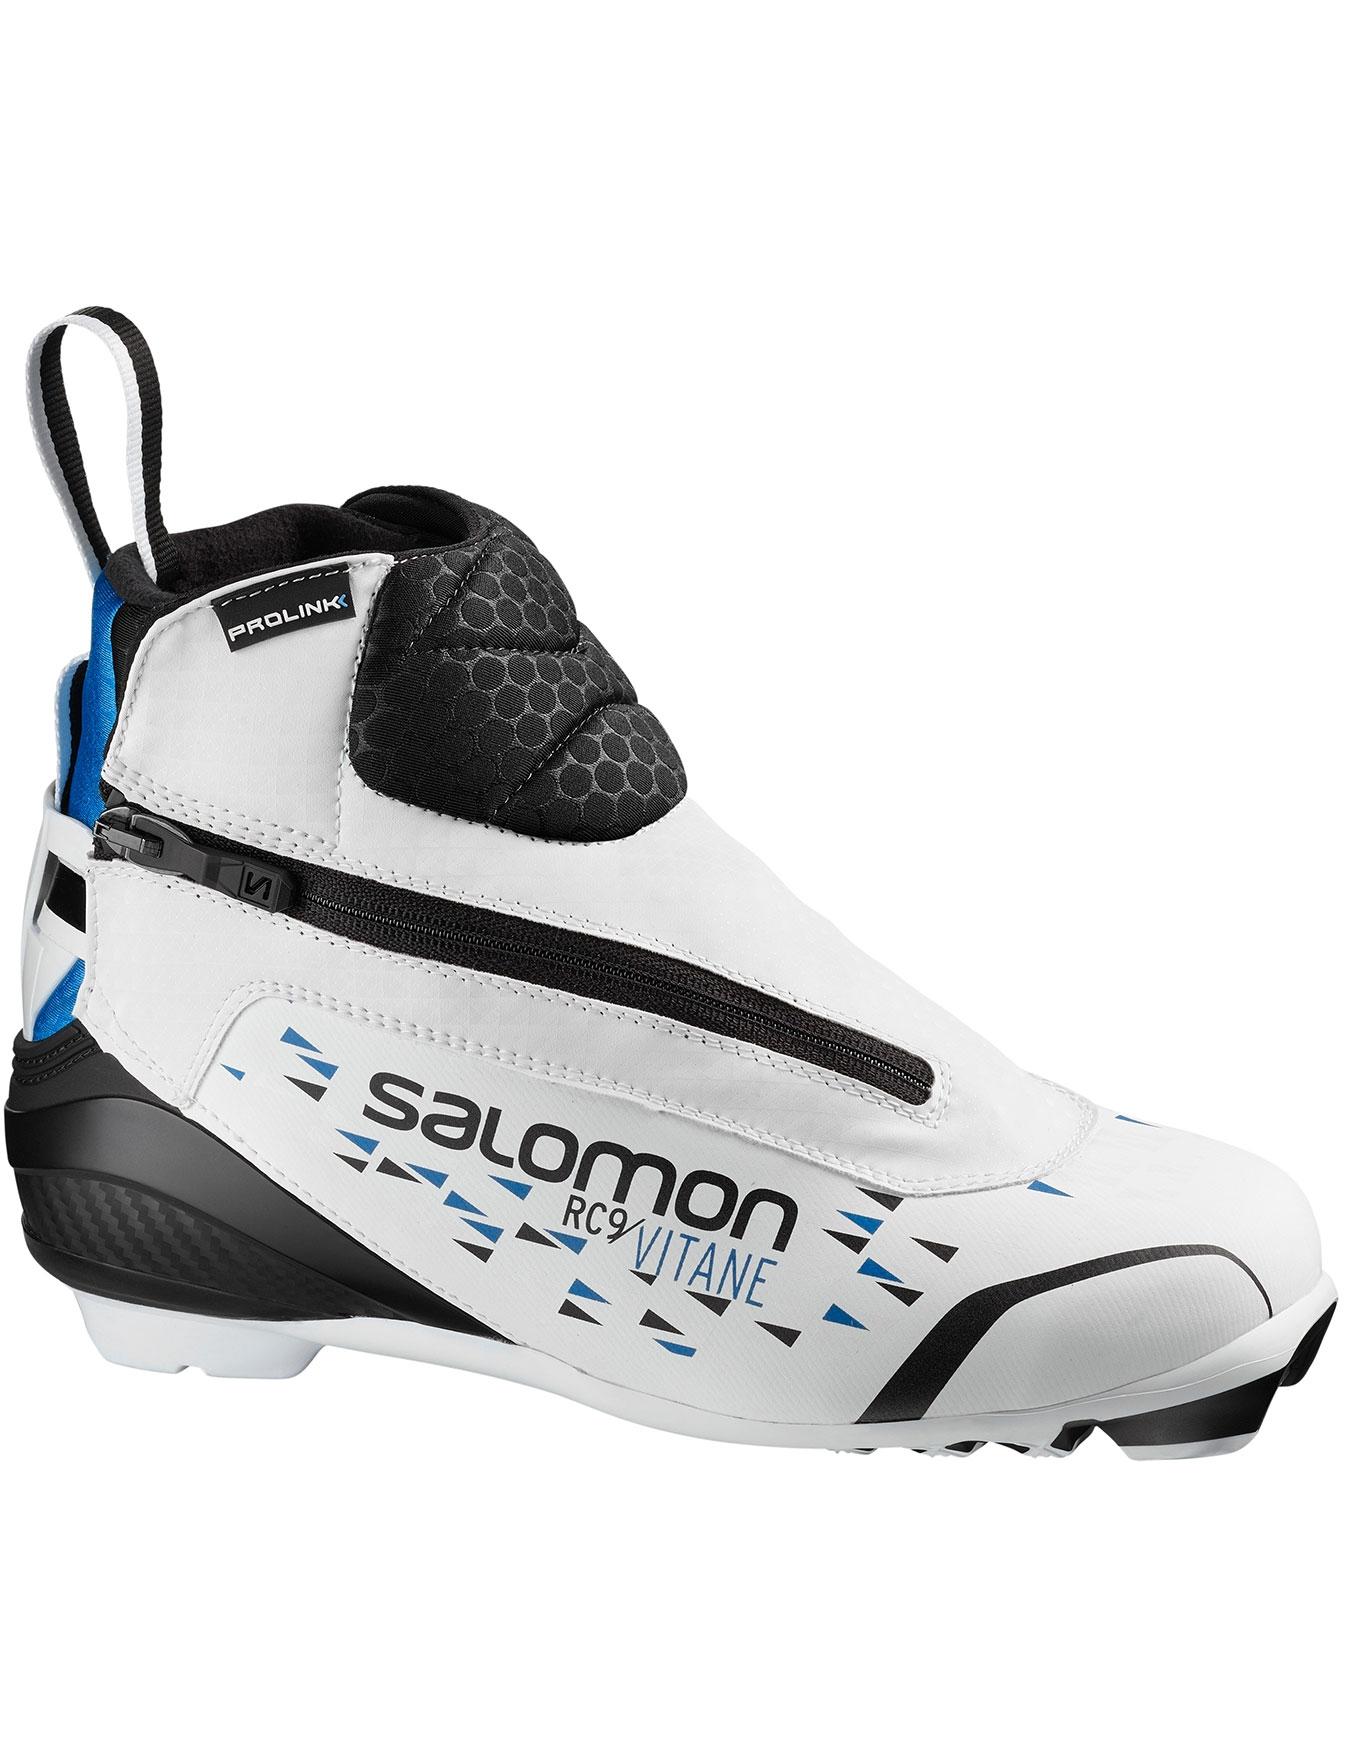 Chaussure de ski Nordique Salomon RC9 Vitane Prolink